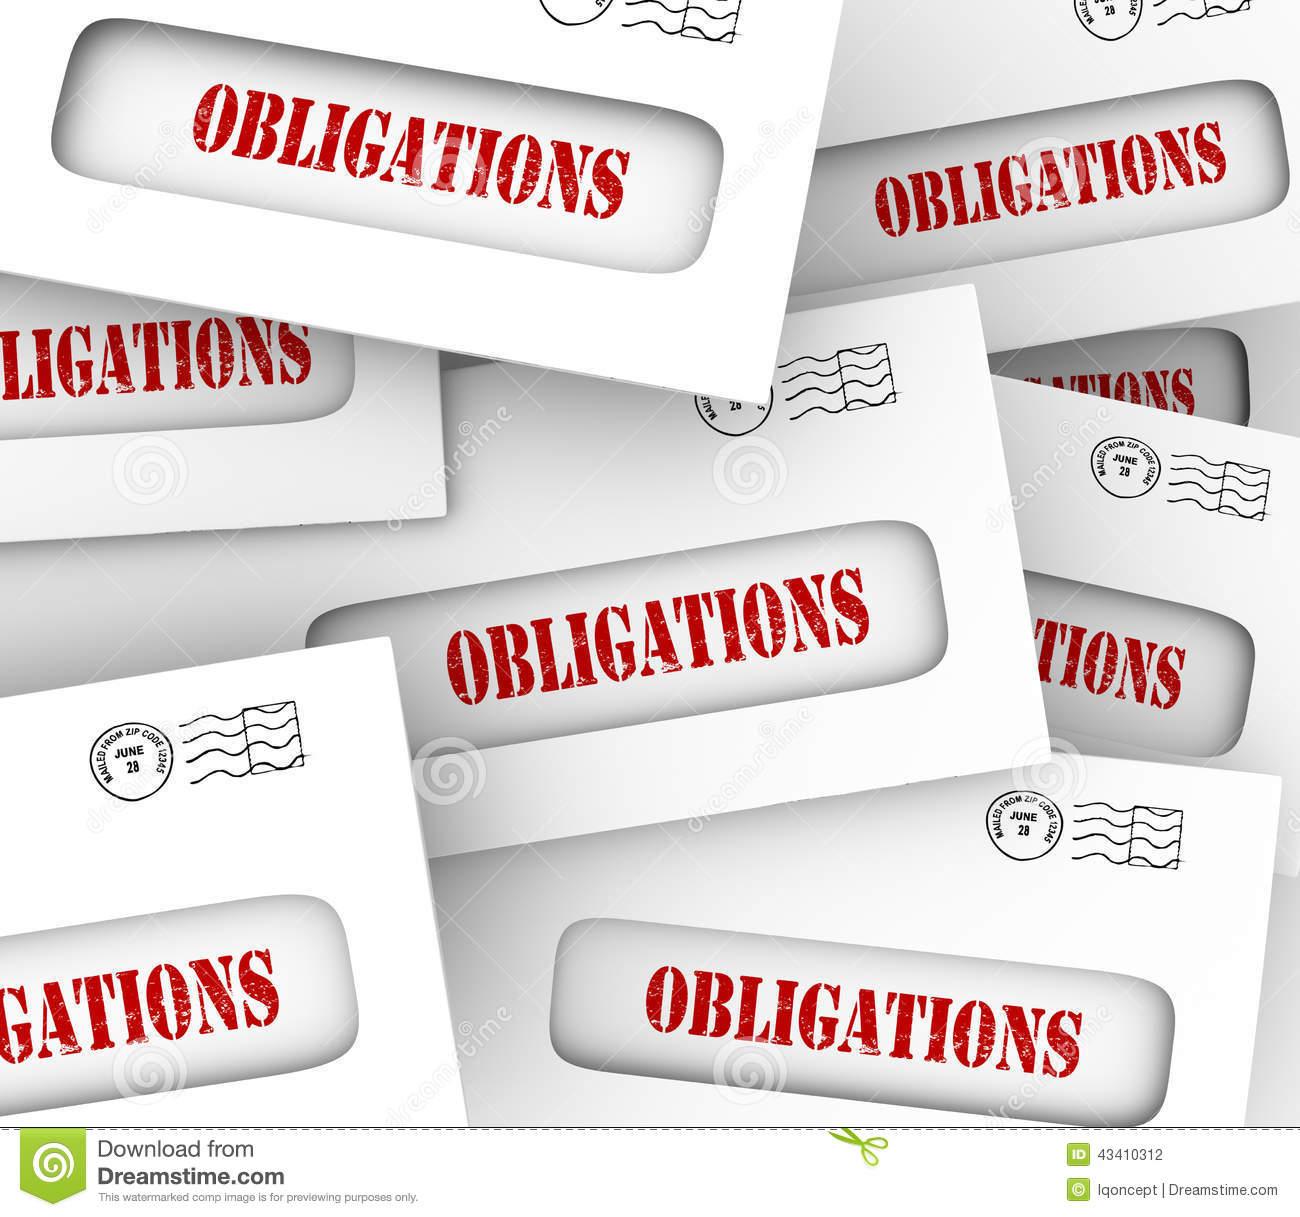 Many Obligations Envelopes Bills Legal Financial Payments Due.